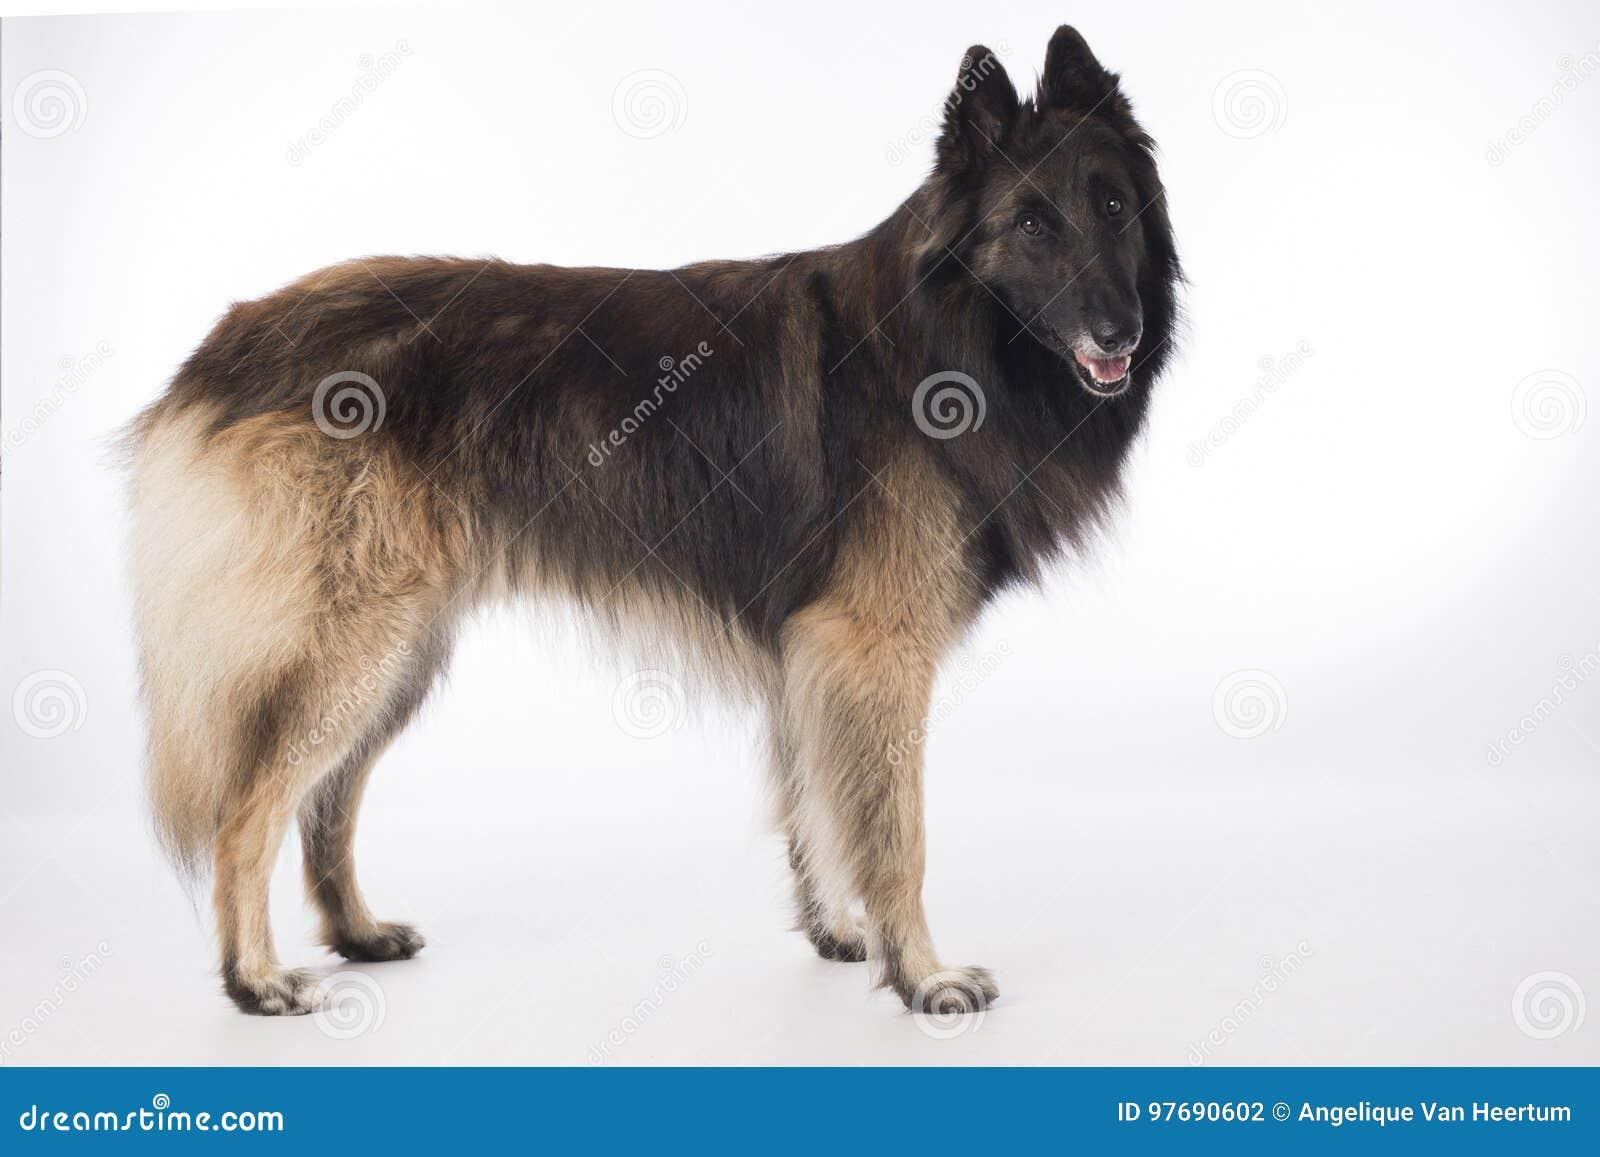 Cão, pastor belga Tervuren, estando no fundo branco do estúdio